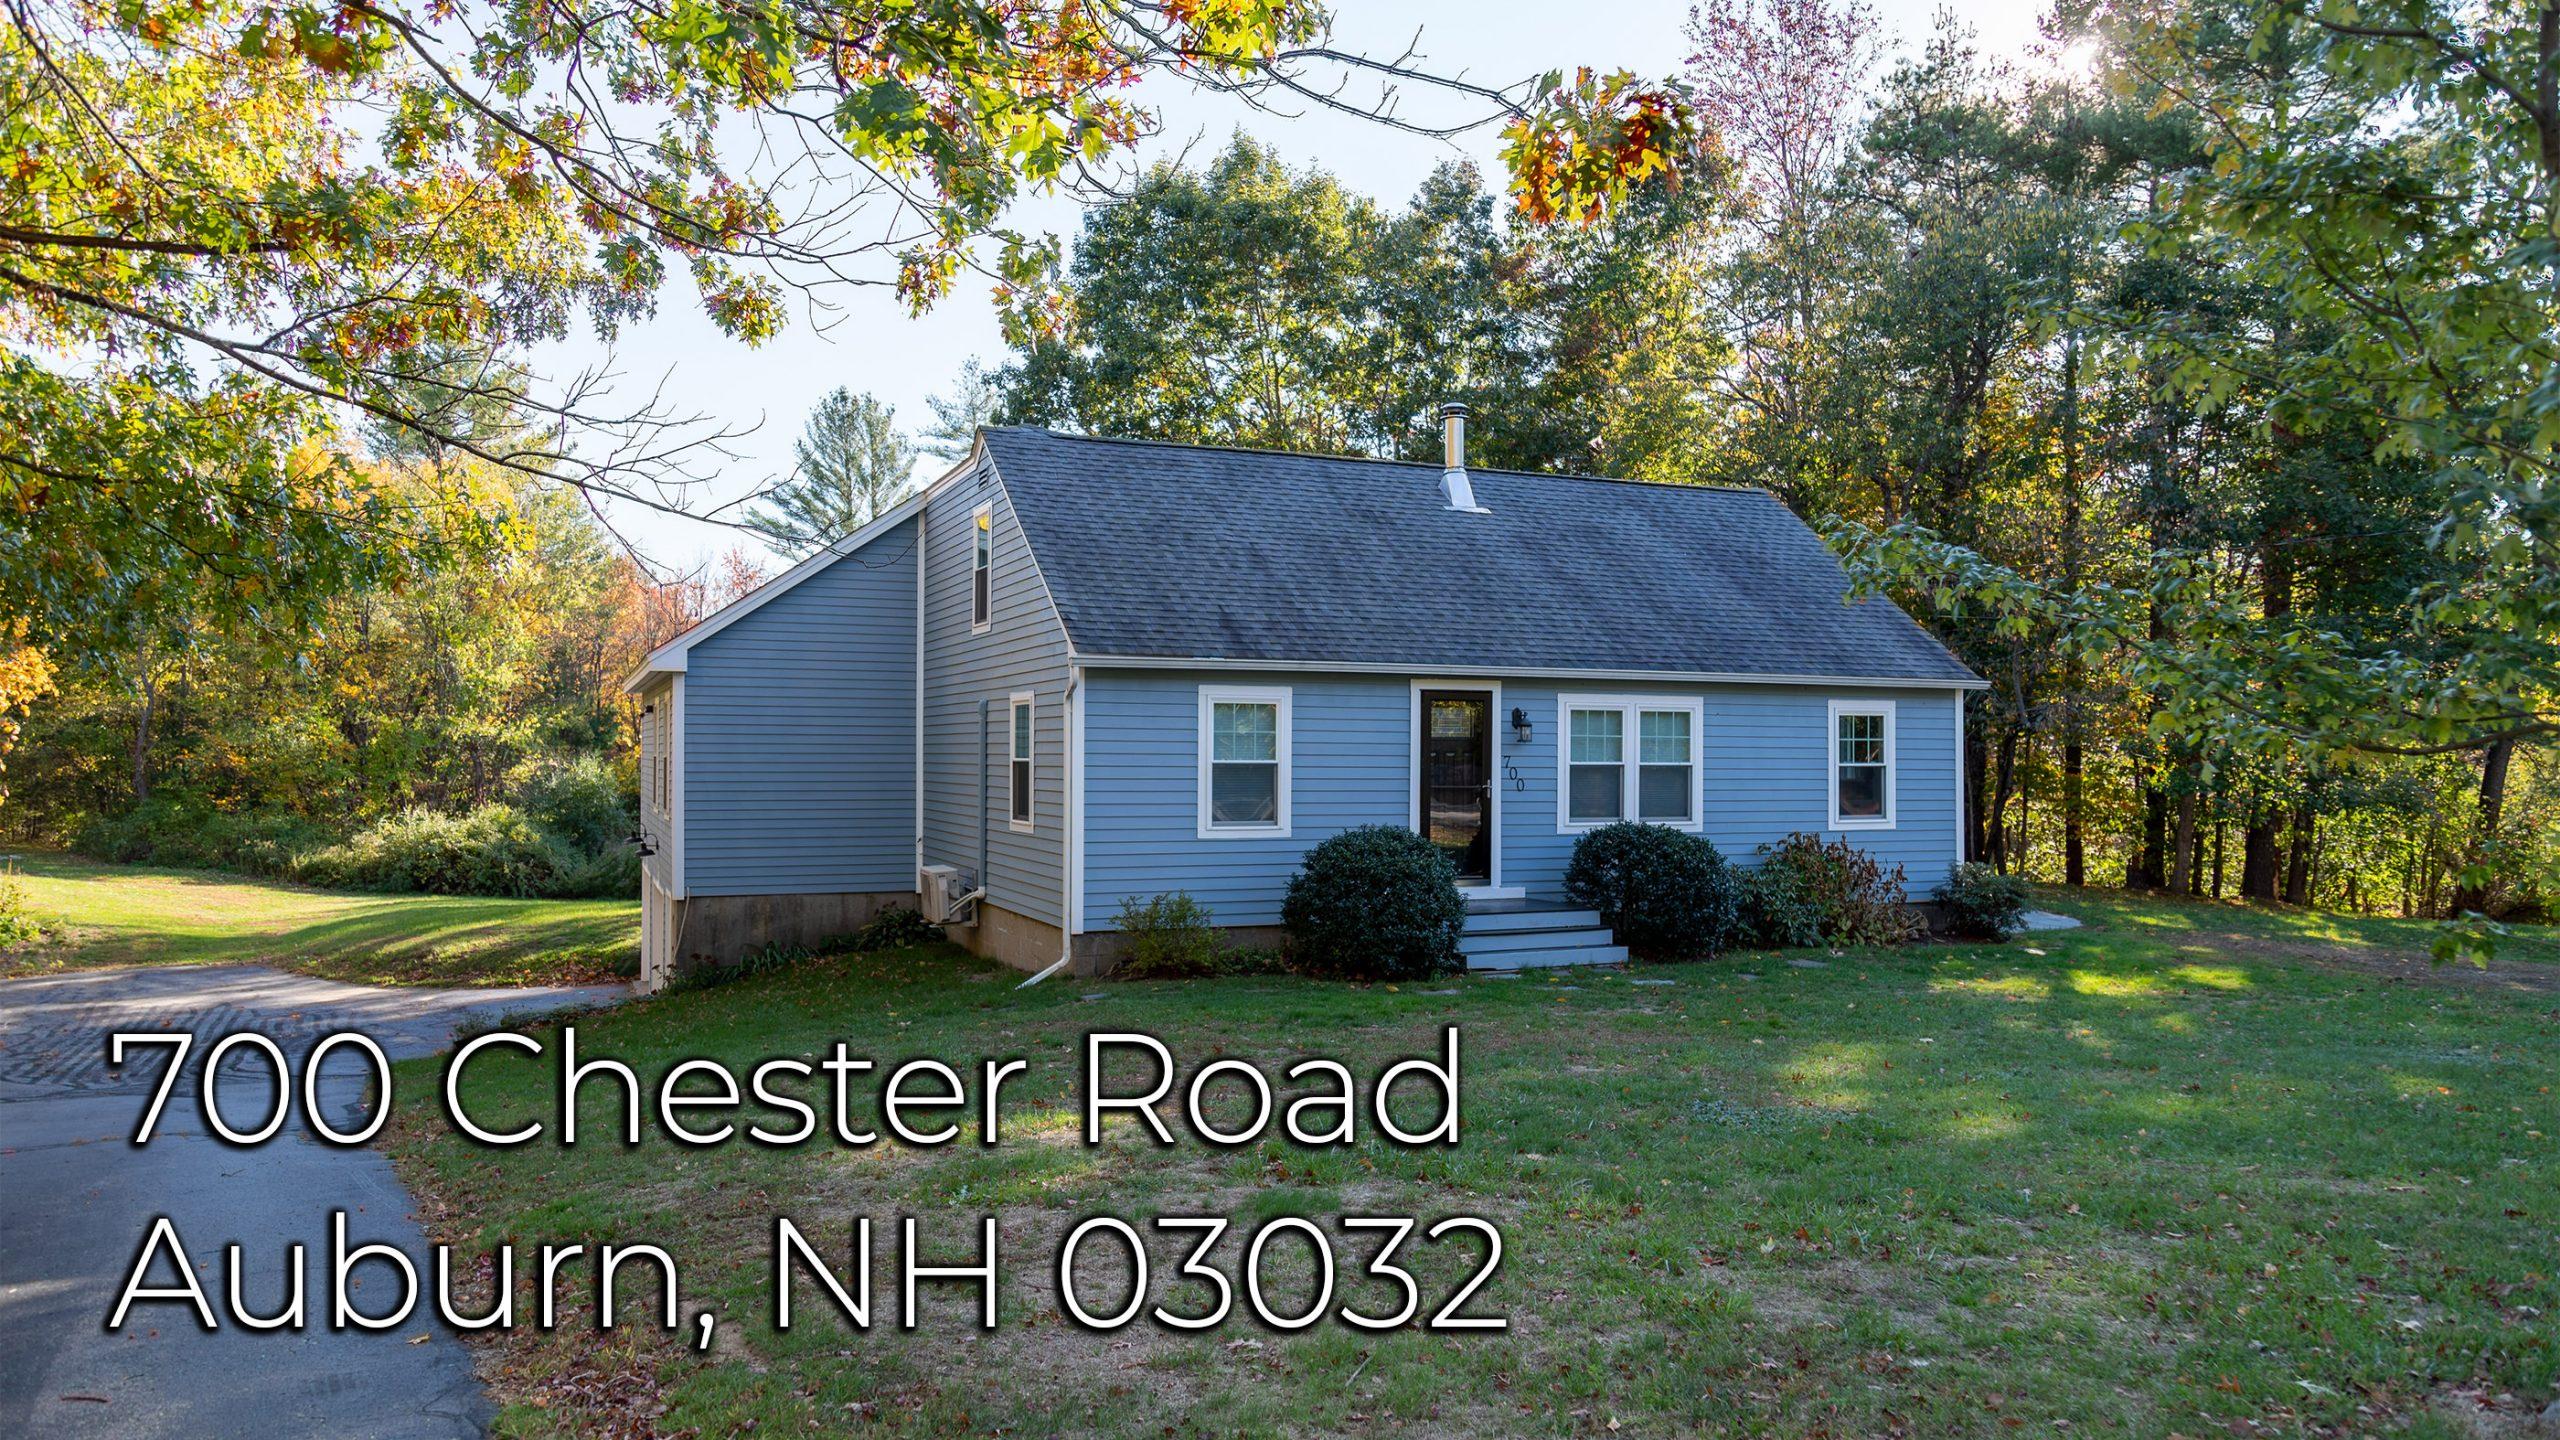 700 Chester Rd Auburn NH 03032